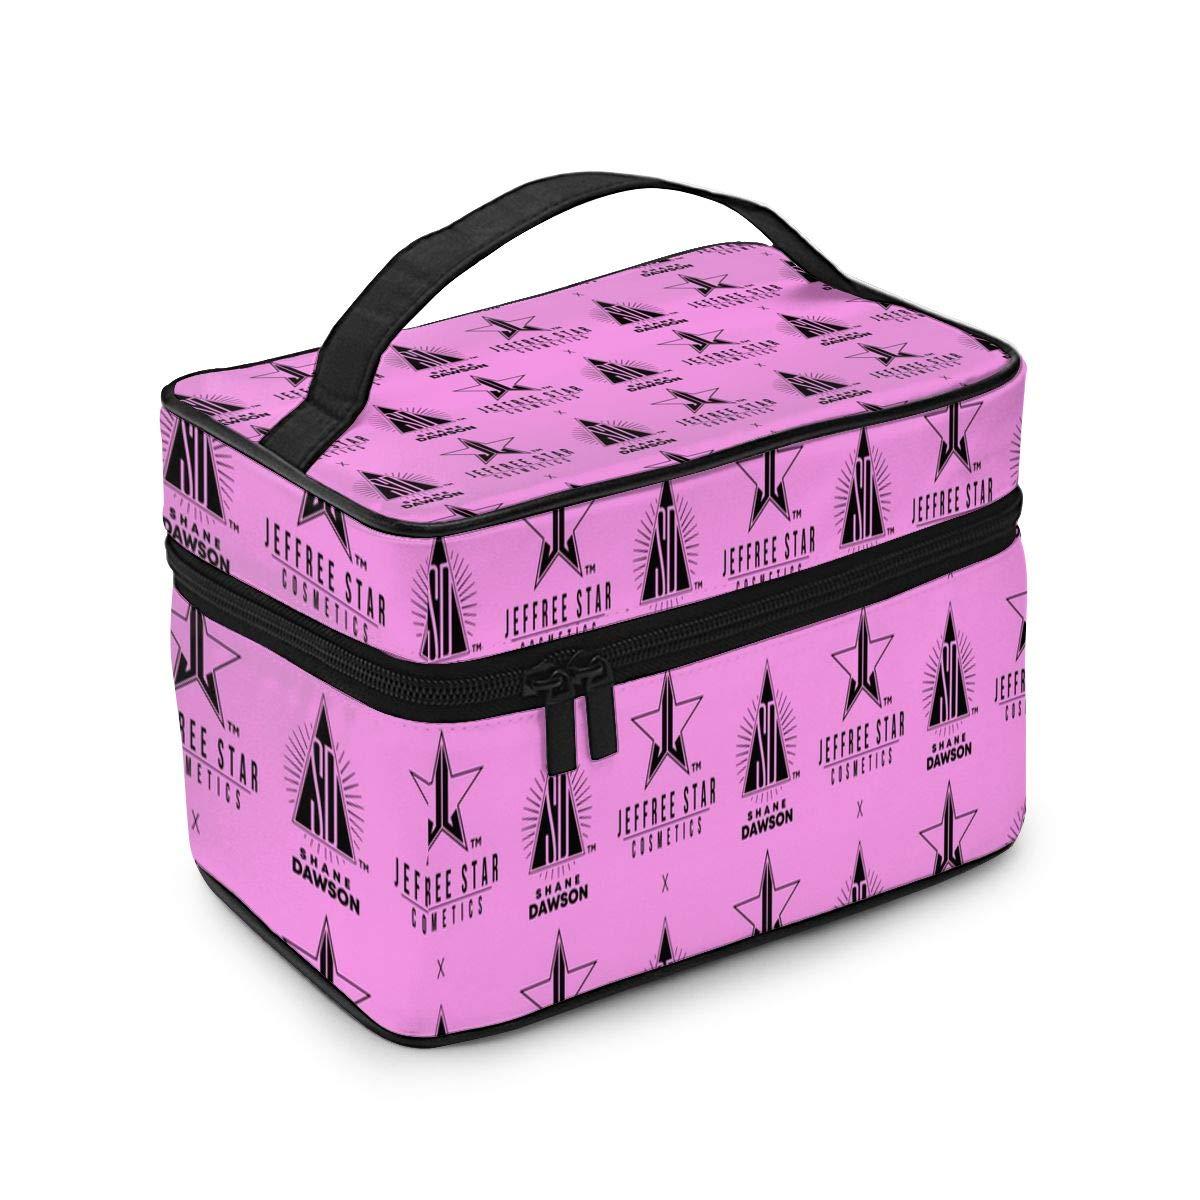 Sh-ane Daw-soN Jef-fr-ee S-taR Makeup Bag Portable Travel Cosmetic Bag For Women Girls Makeup Bag Organizer Makeup Boxes